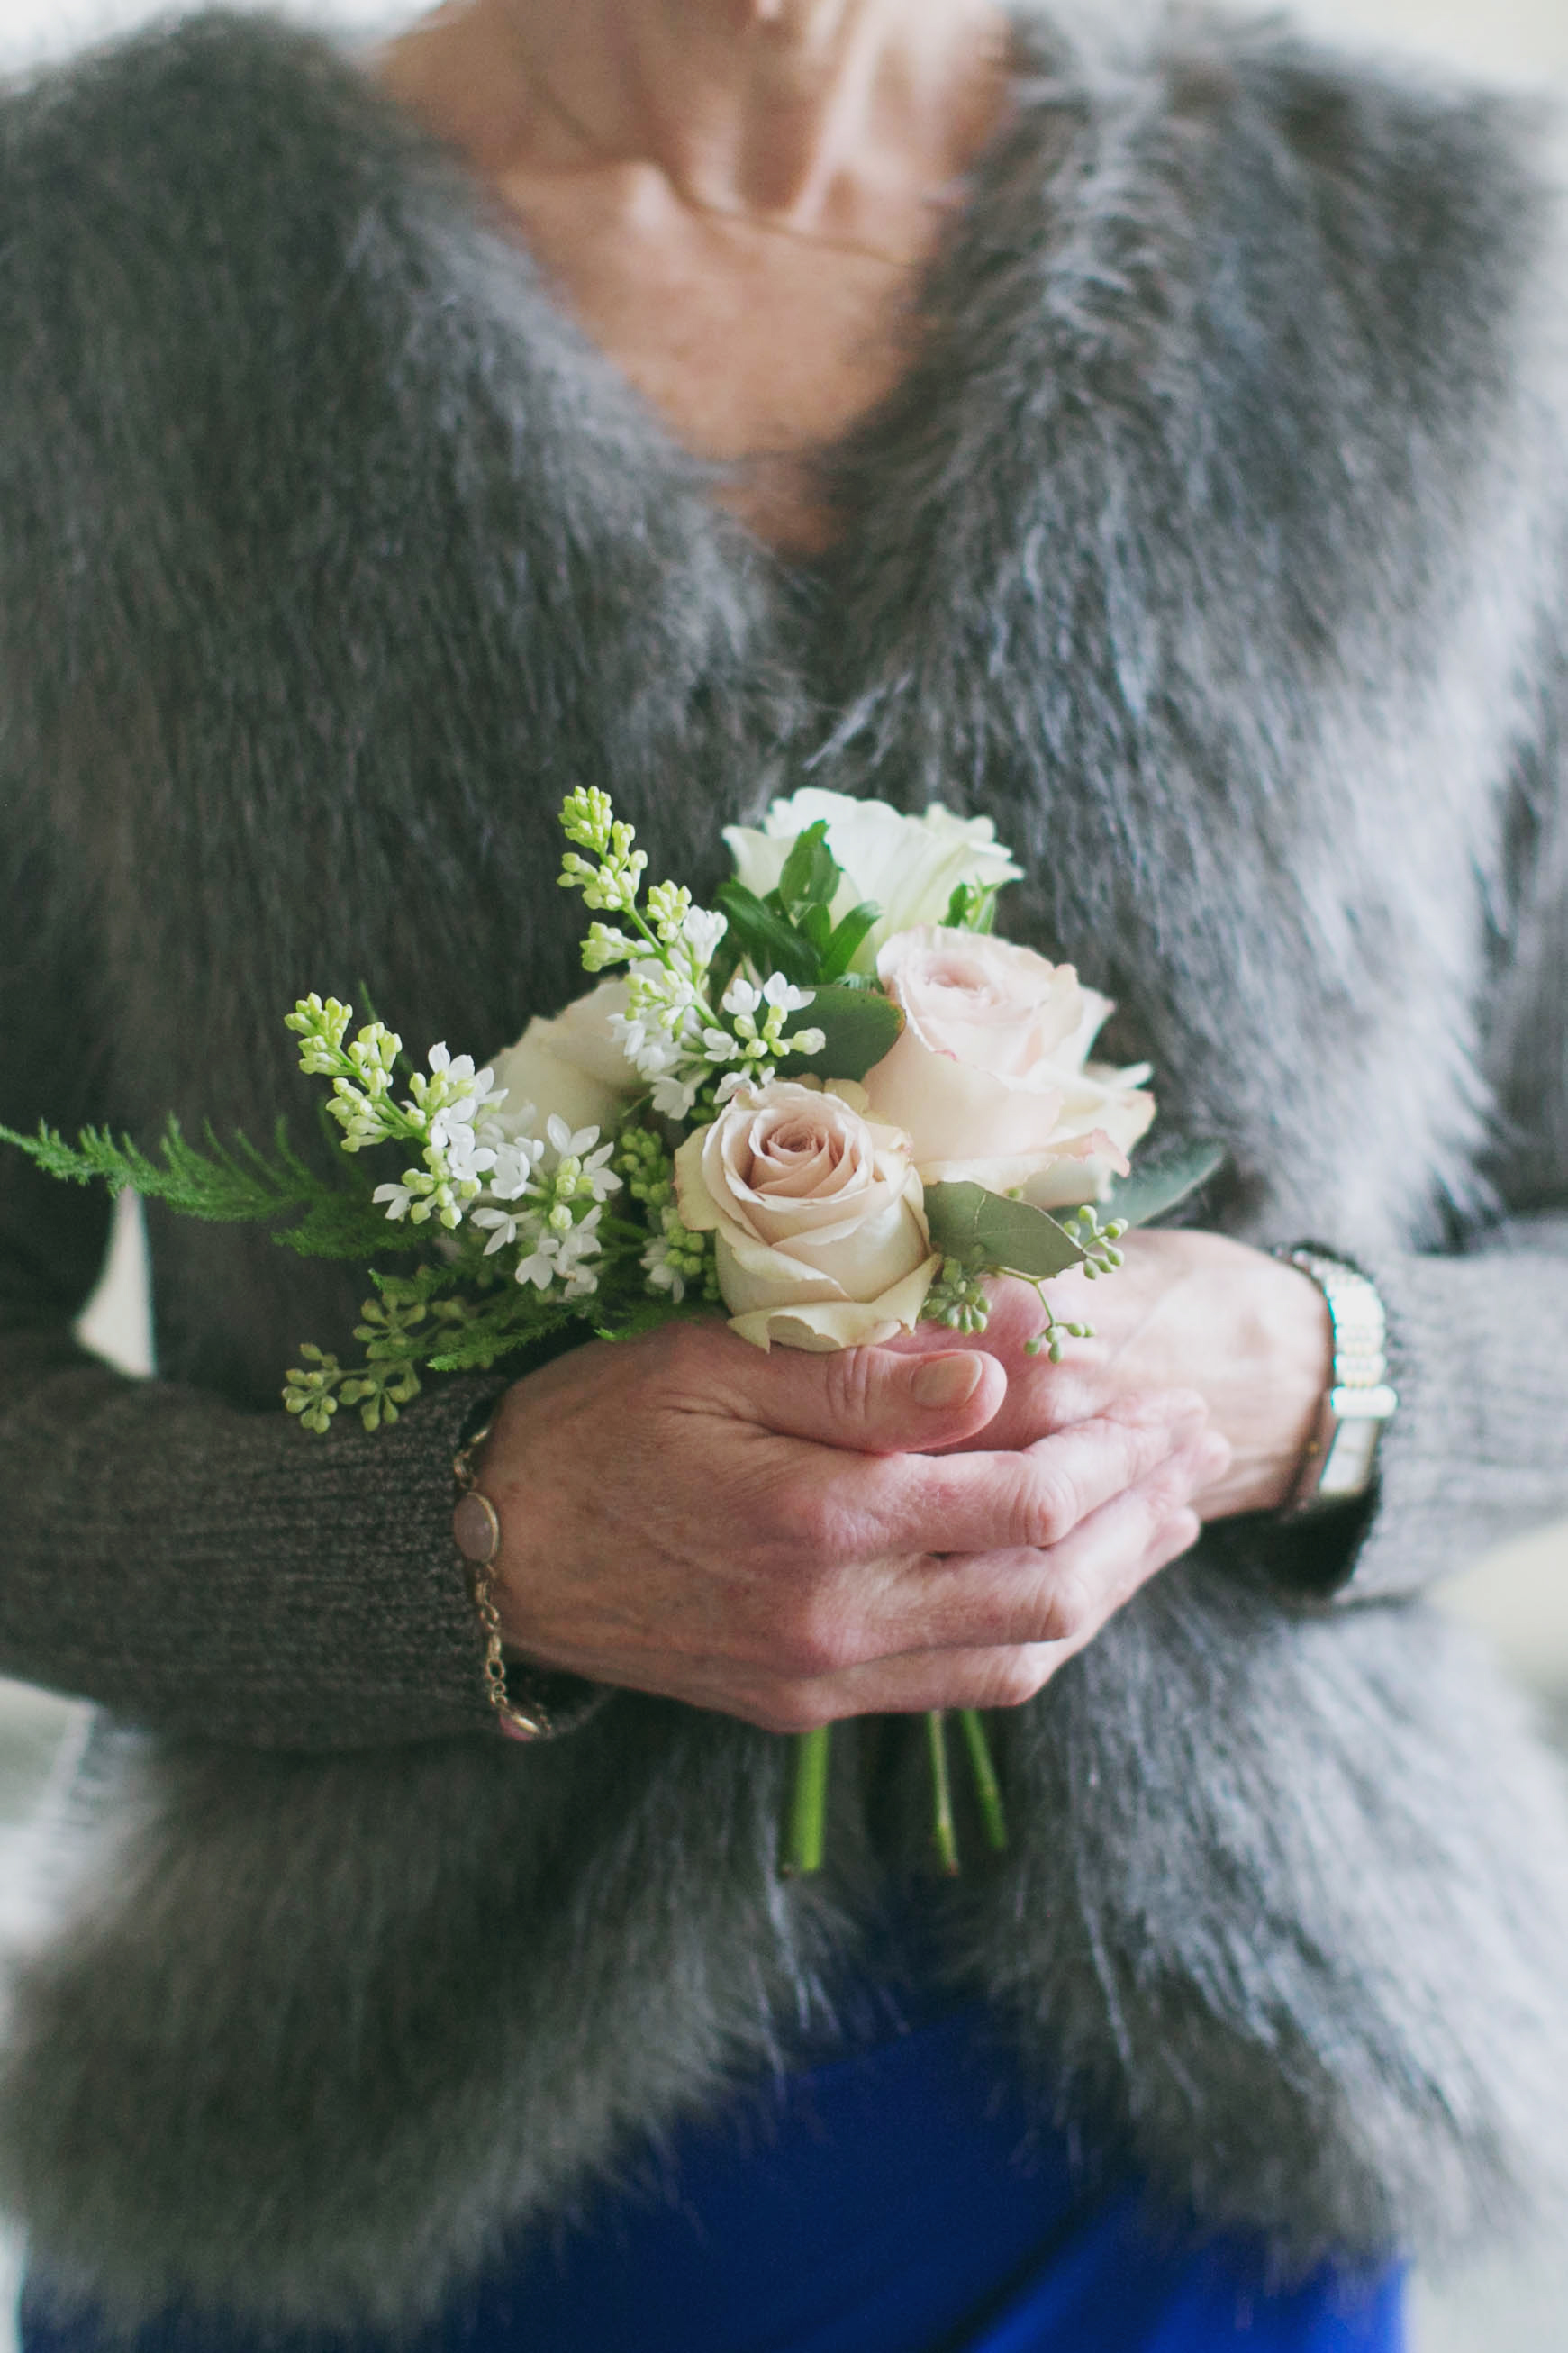 Simply-Charming-Socials_Atlanta-Wedding-Planner_Our-Labor-Of-Love_Emily-and-Jon_13.jpg